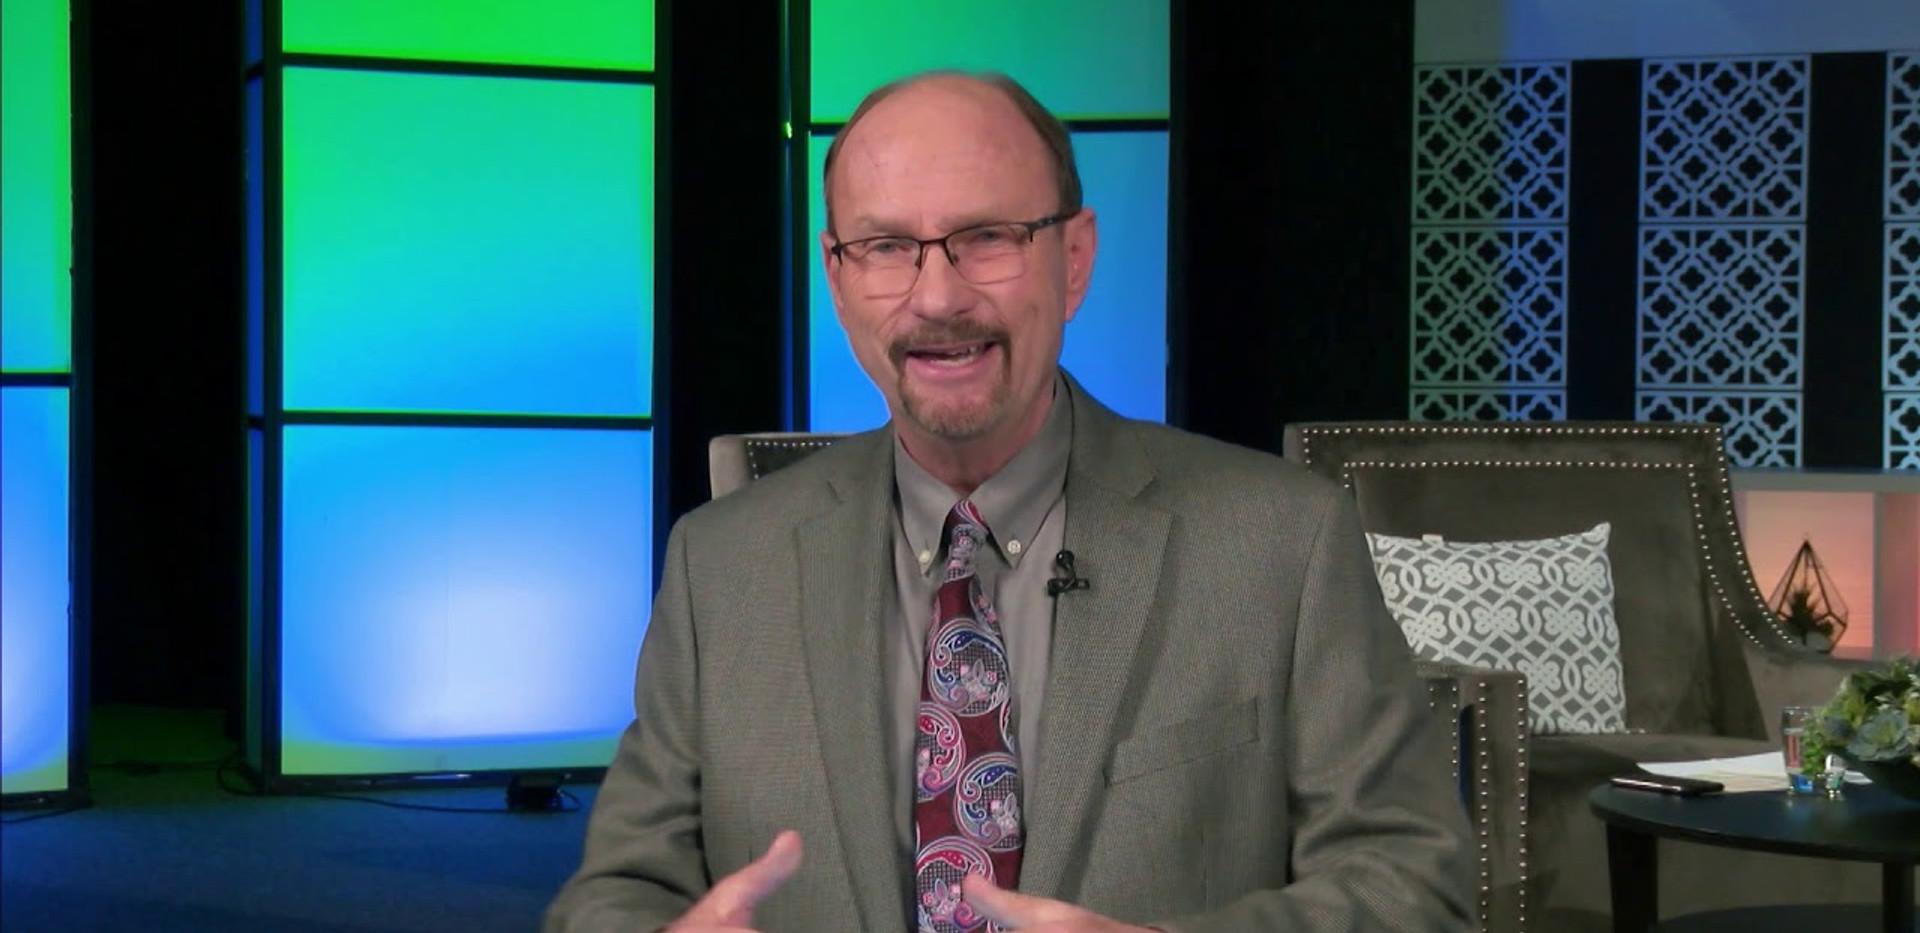 Dick Deweert shares on how worship is warfare